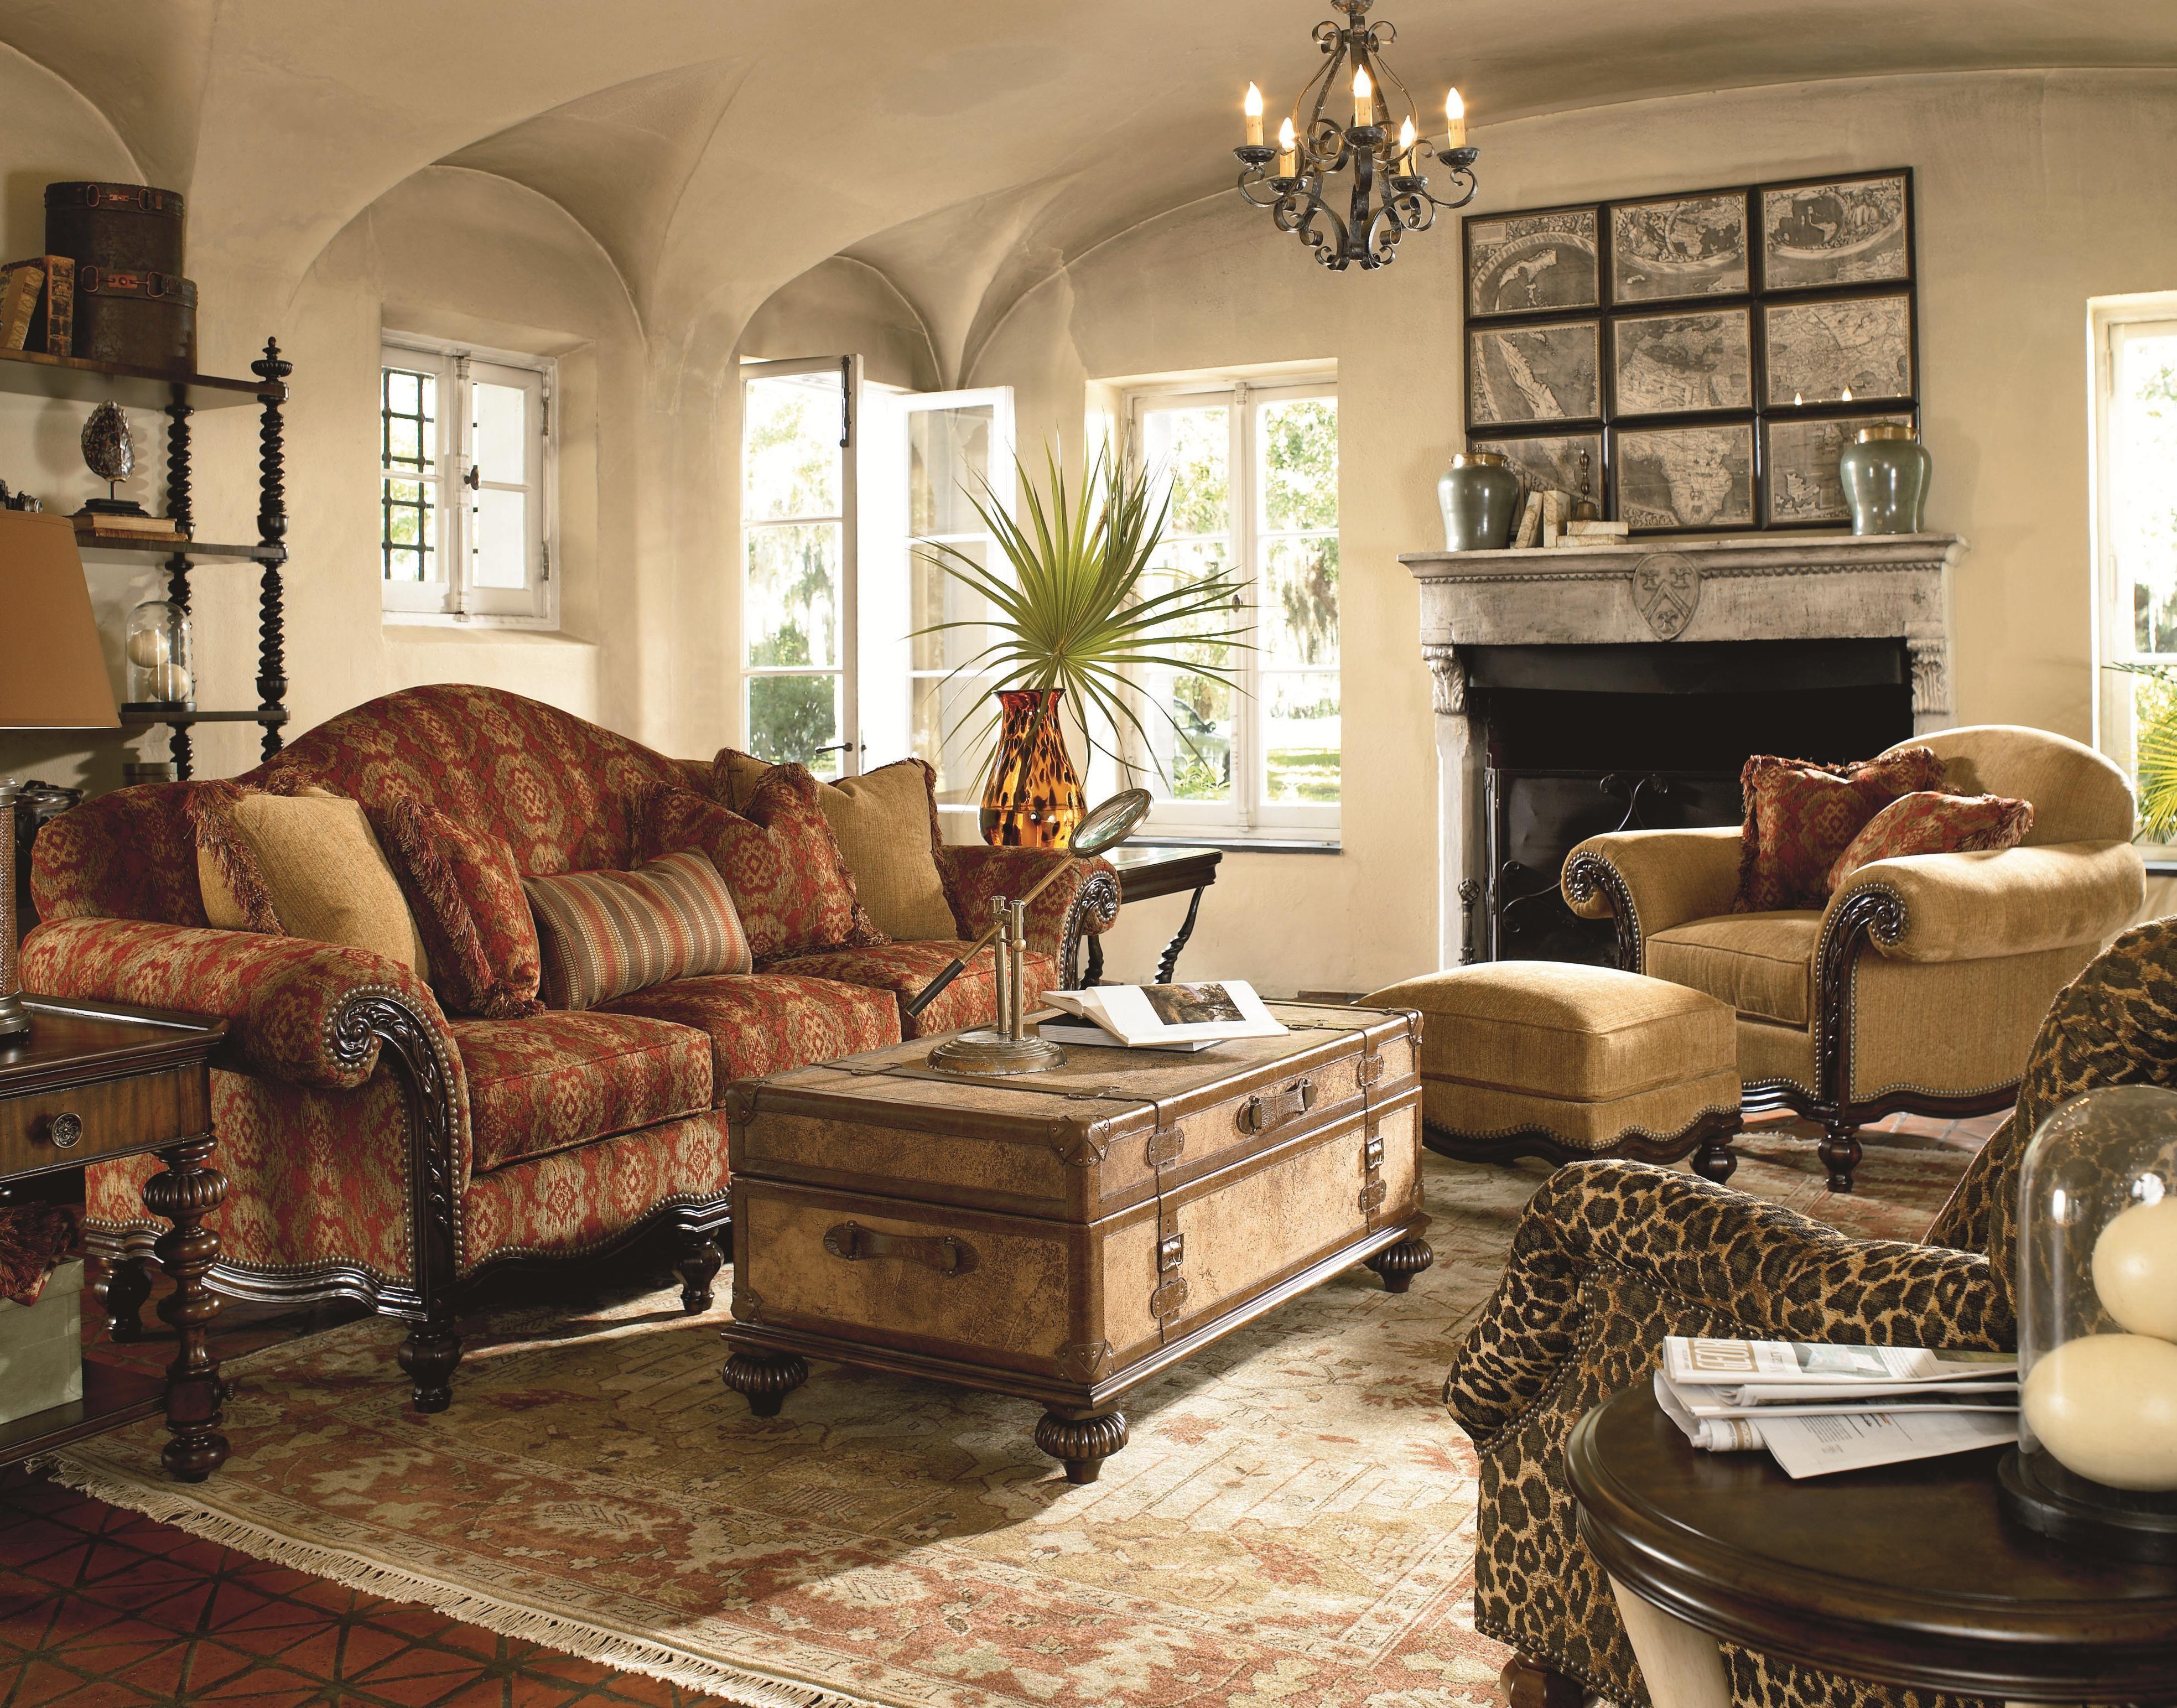 Ernest Hemingway 462 Fabric By Thomasville Baer S Furniture Dealer Florida